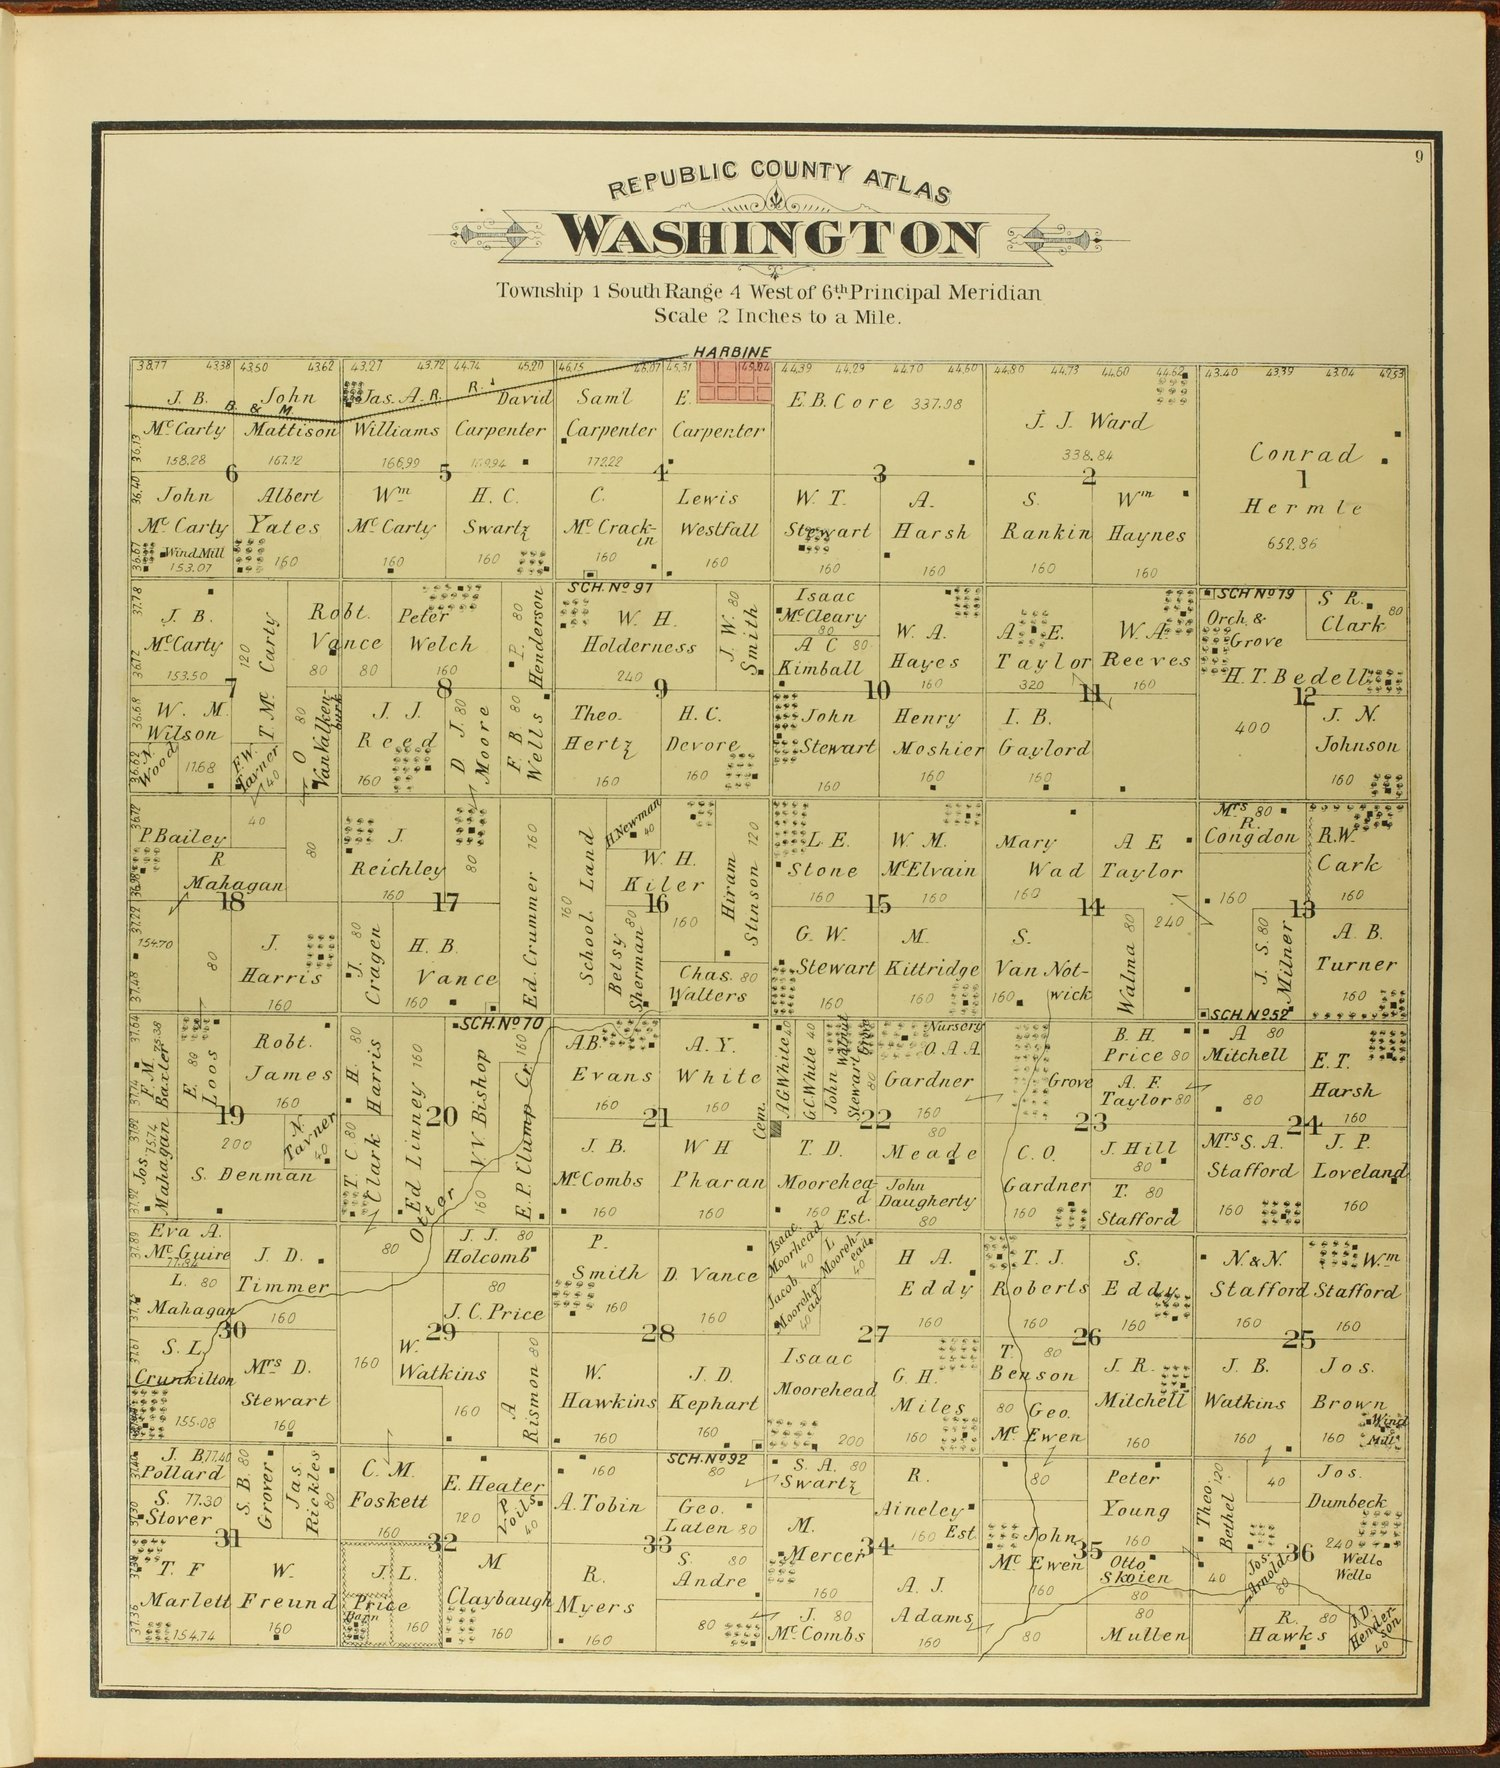 Atlas of Republic County, Kansas - 9